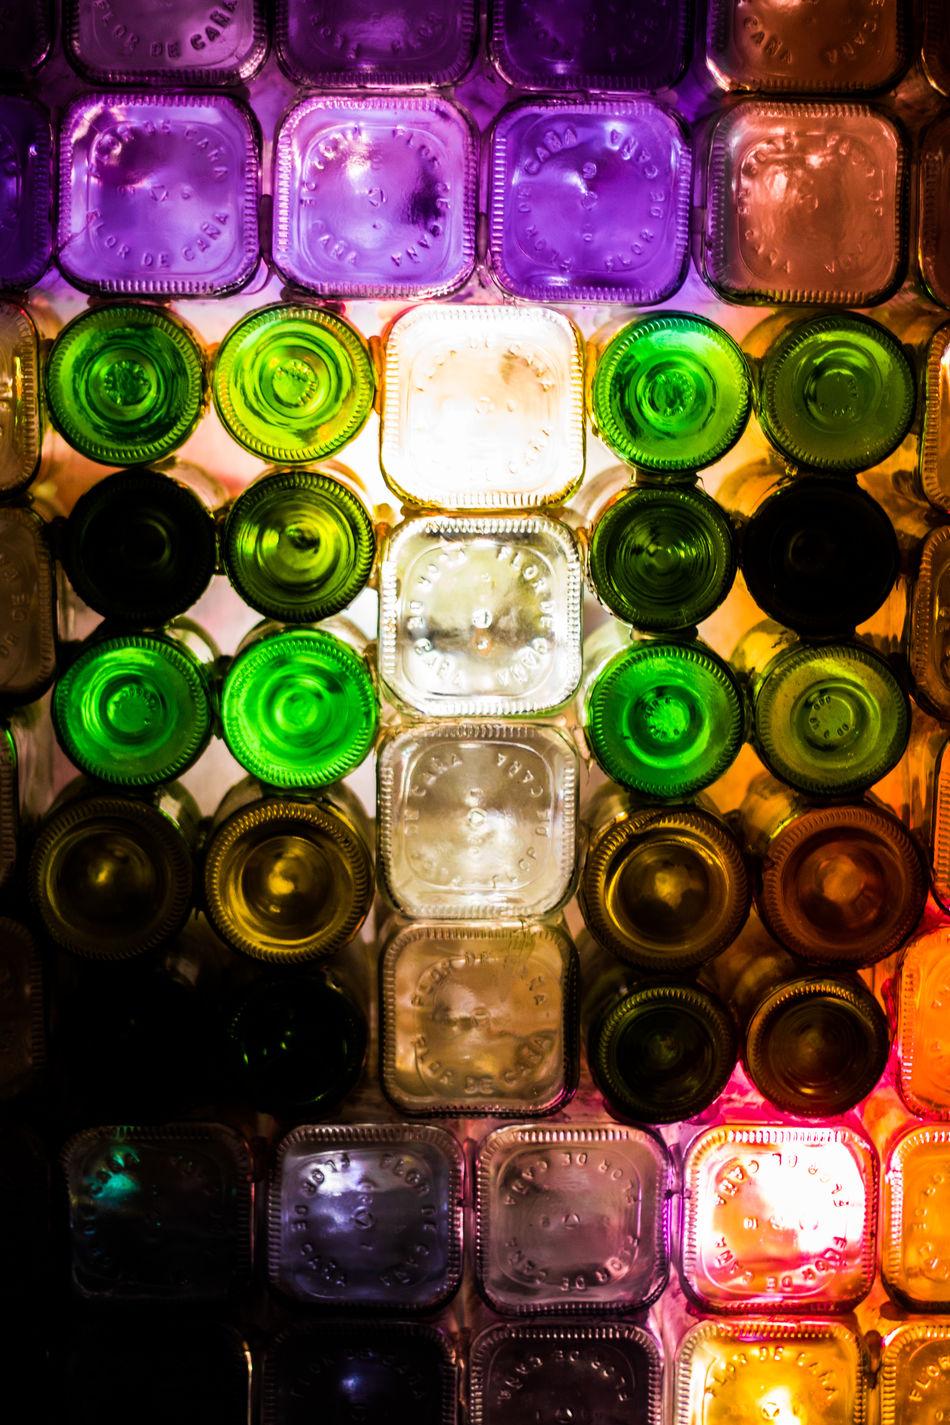 Backgrounds Bottle Bottles Bottles Collection Close-up Day Drink Freshness Full Frame Green Color Indoors  Multi Colored No People Variation